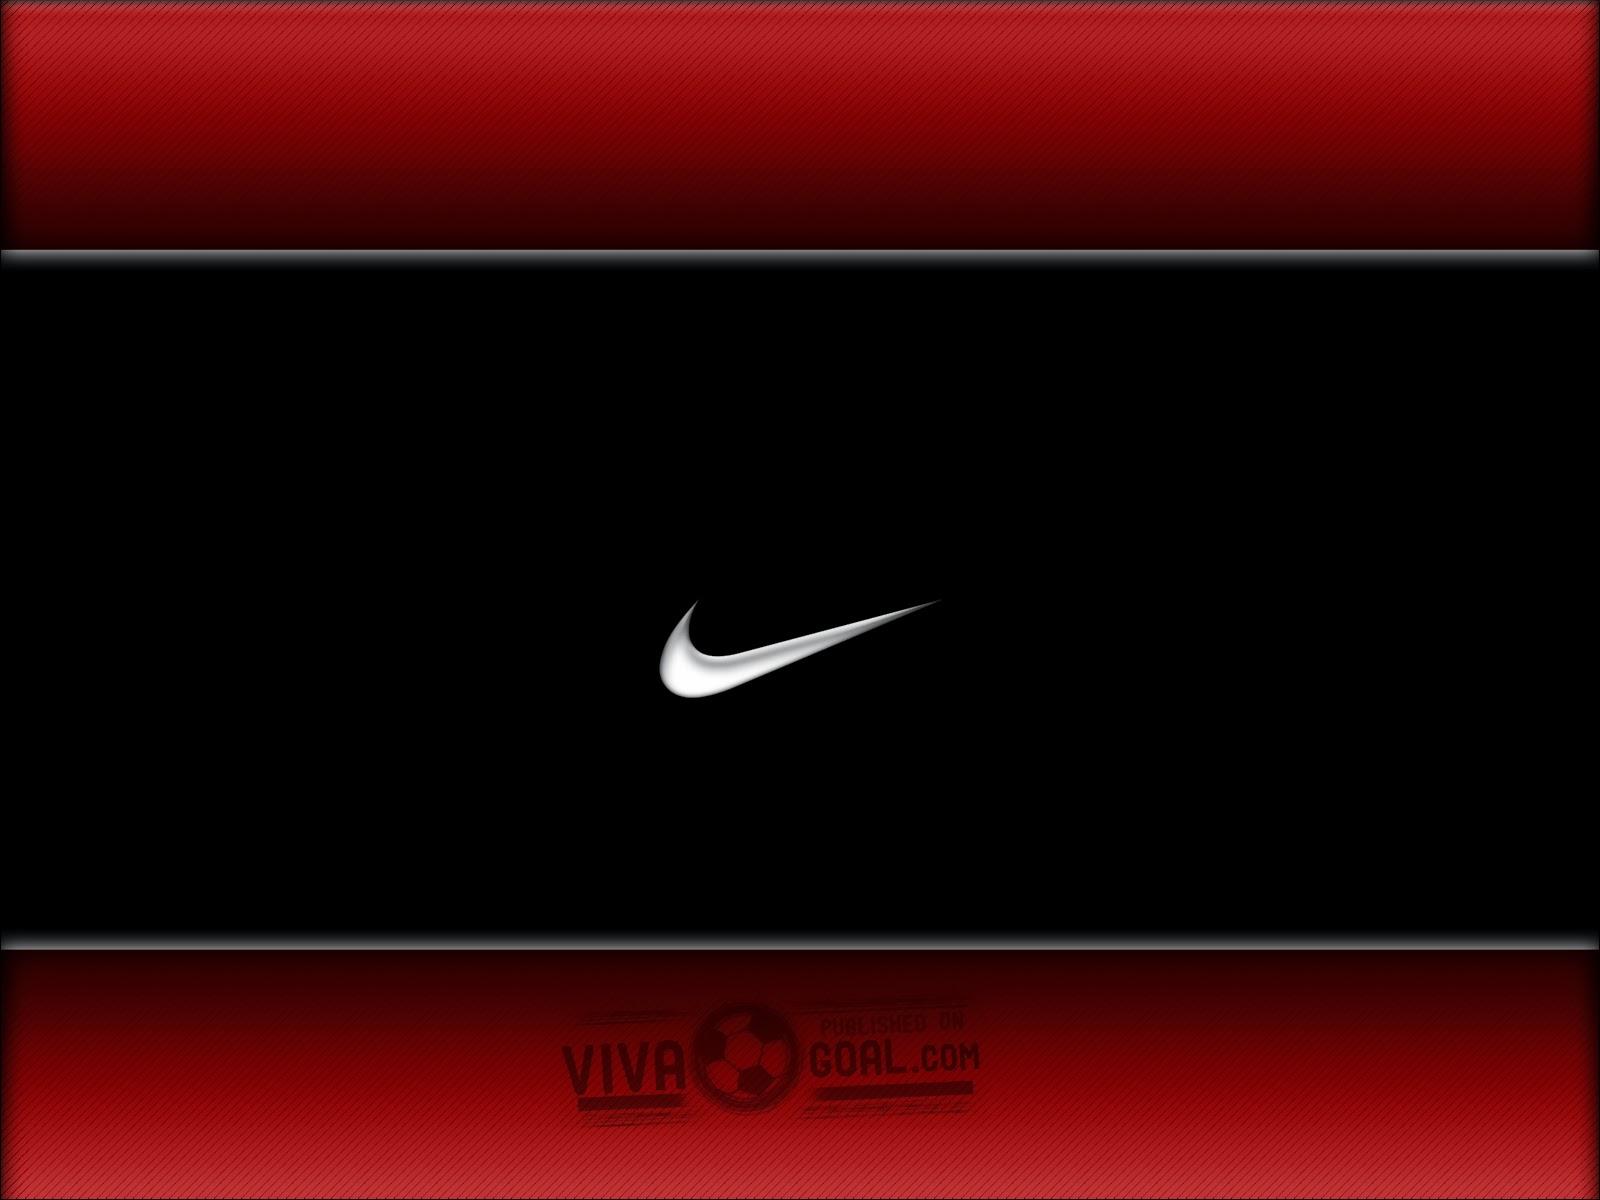 Nike football wallpaper computer   beautiful desktop wallpapers 2014 1600x1200